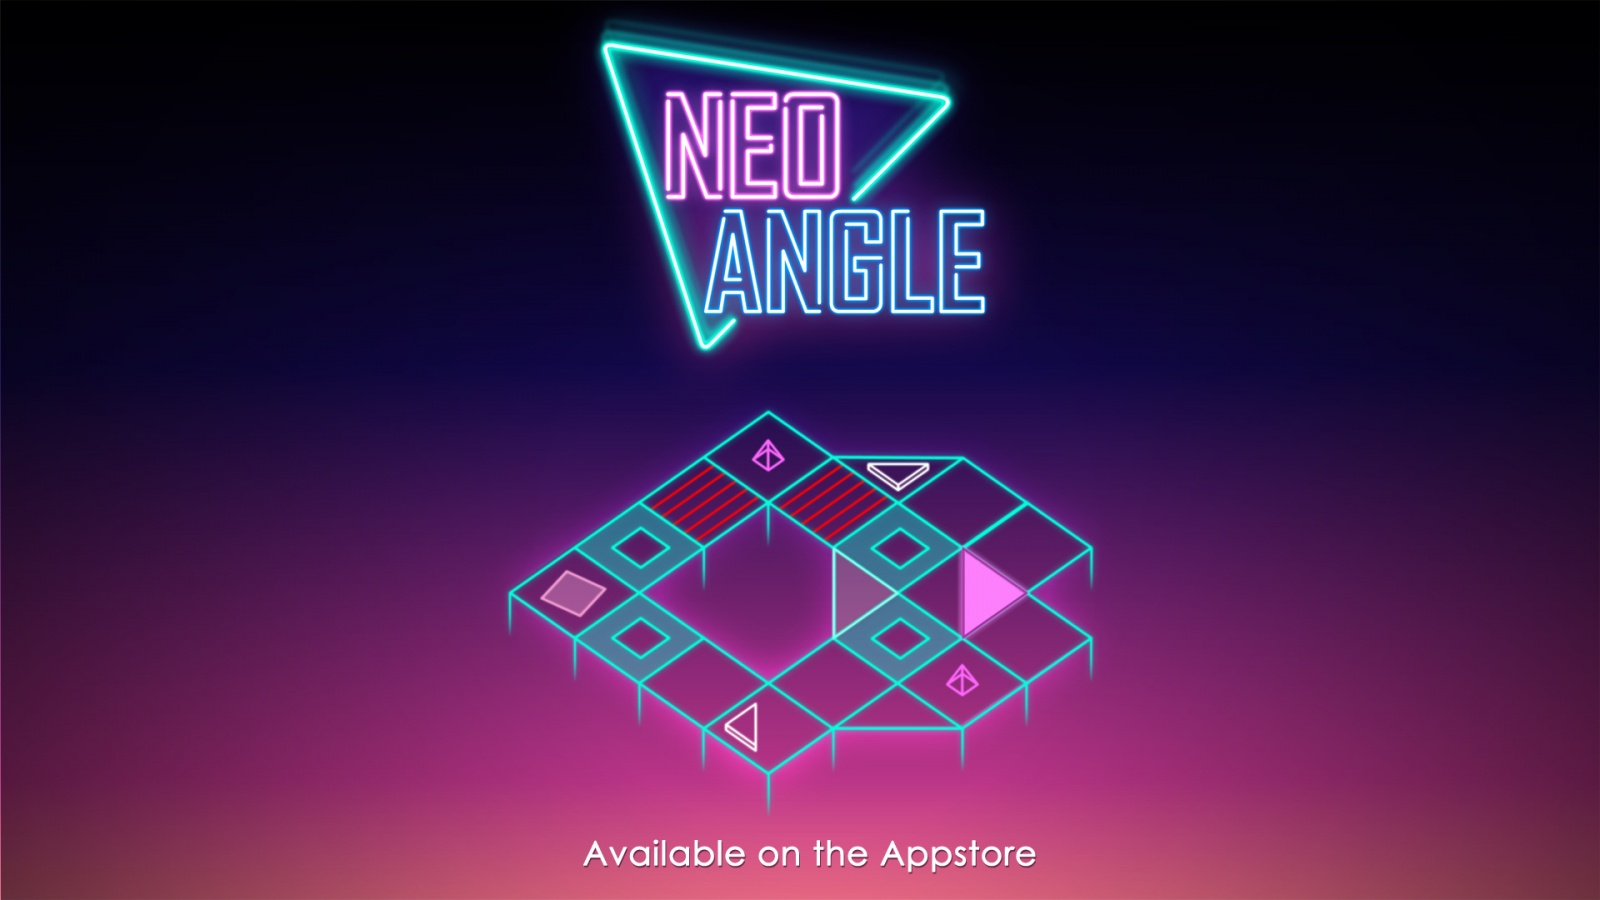 Игра-головоломка Neo Angle. Продолжение истории разработки и релиз в Appstore - 8